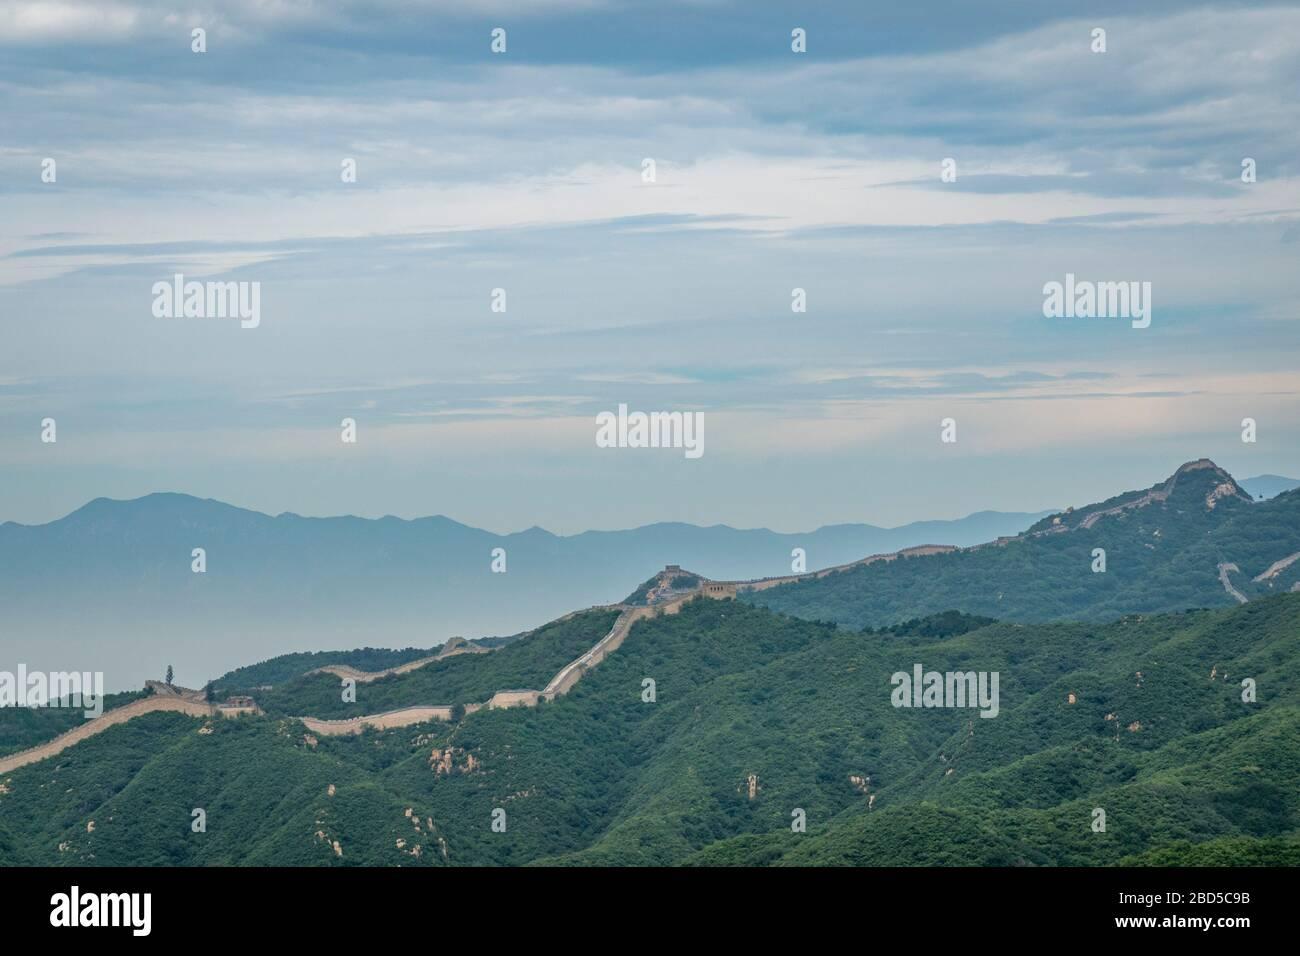 Great Wall of China, Yanqing District, near Beijing, China Stock Photo